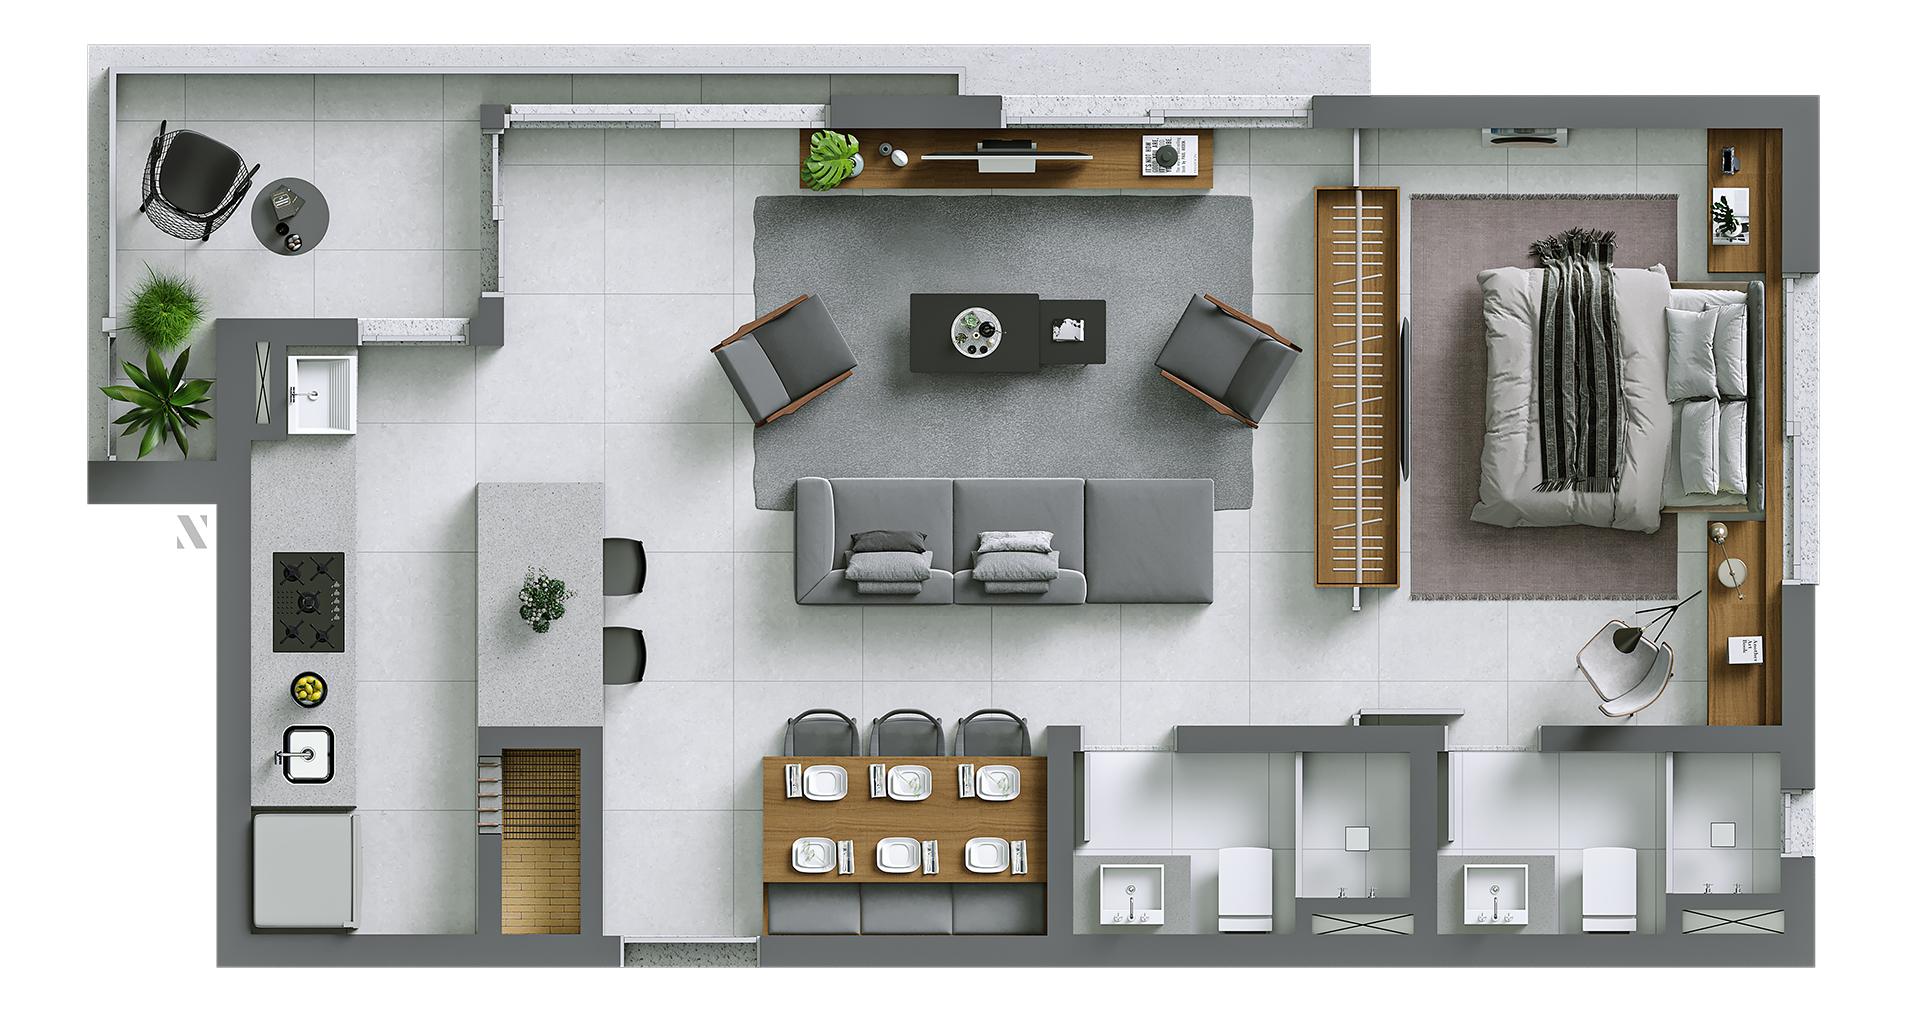 Vida planta: Apartamento 04 - living estendido - 72,50 m²